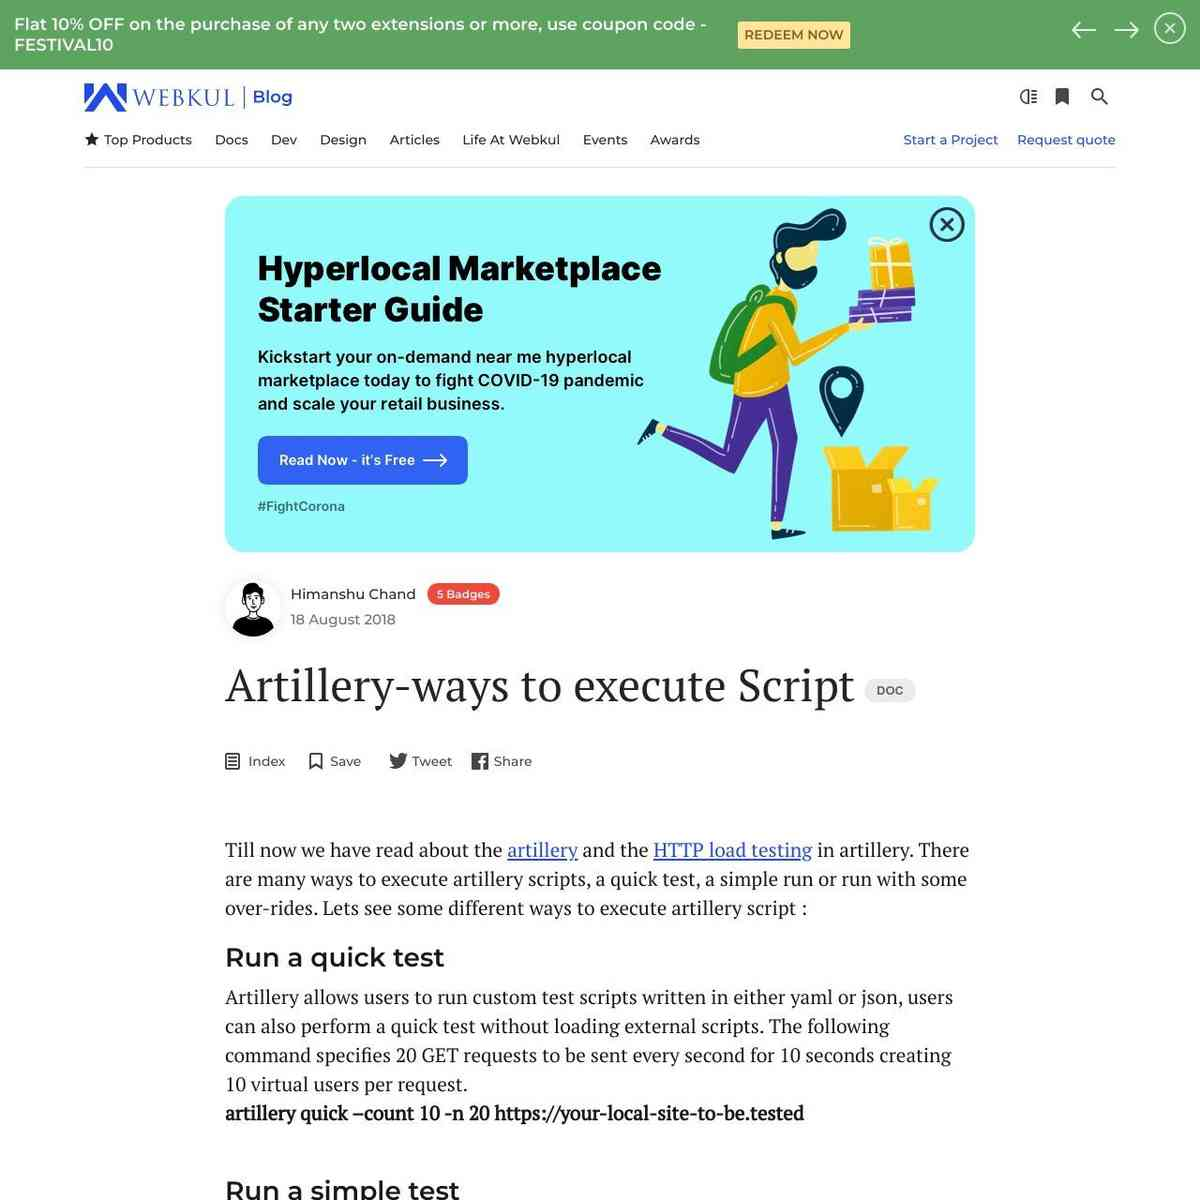 Artillery-ways to execute Script -Automation testing ,Webkul Blog